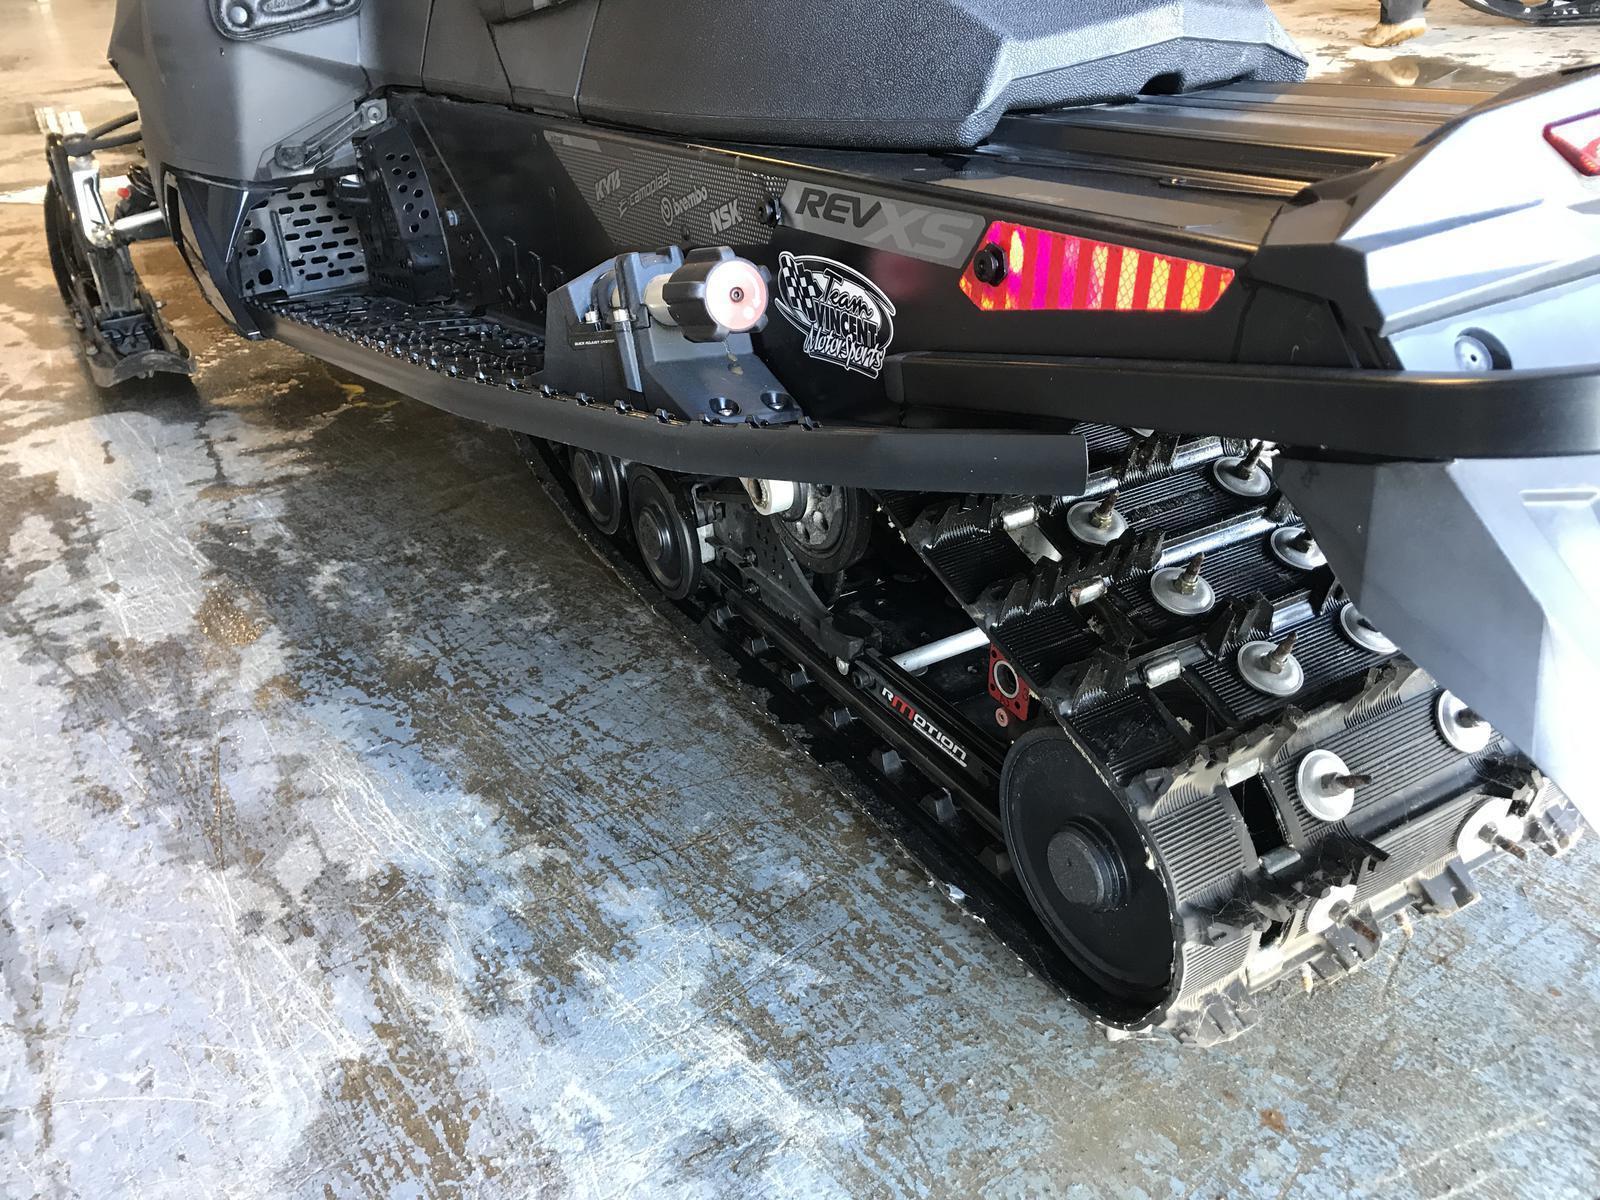 2015 Ski Doo MX Z X-RS w/ QAS 800 E-TEC   2 of 3